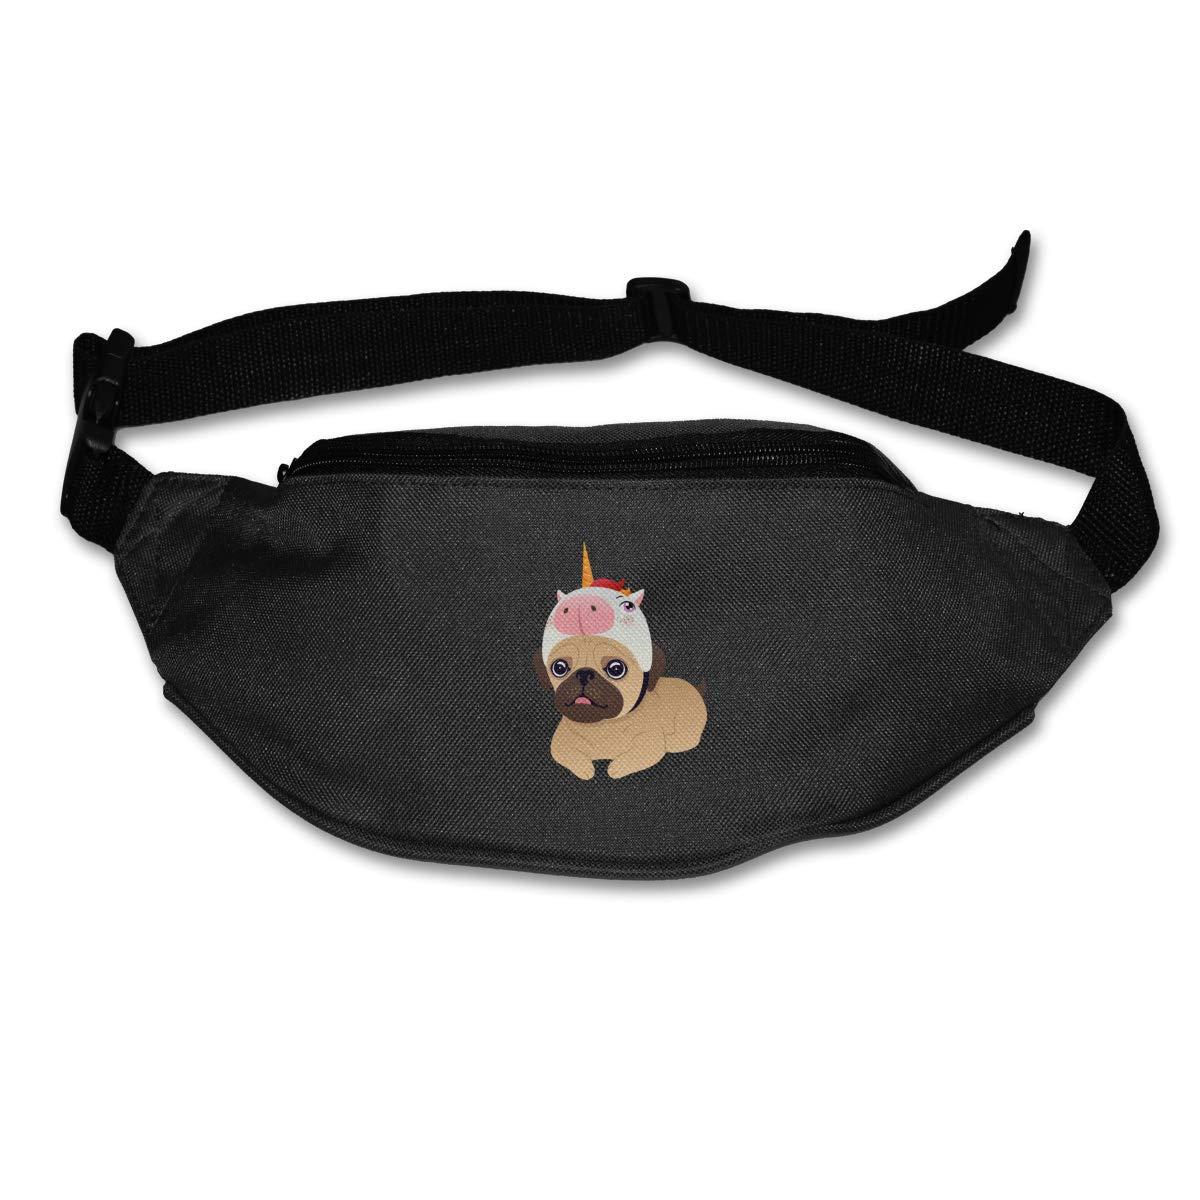 Funny Unicorn Dog Sport Waist Packs Fanny Pack Adjustable For Hike